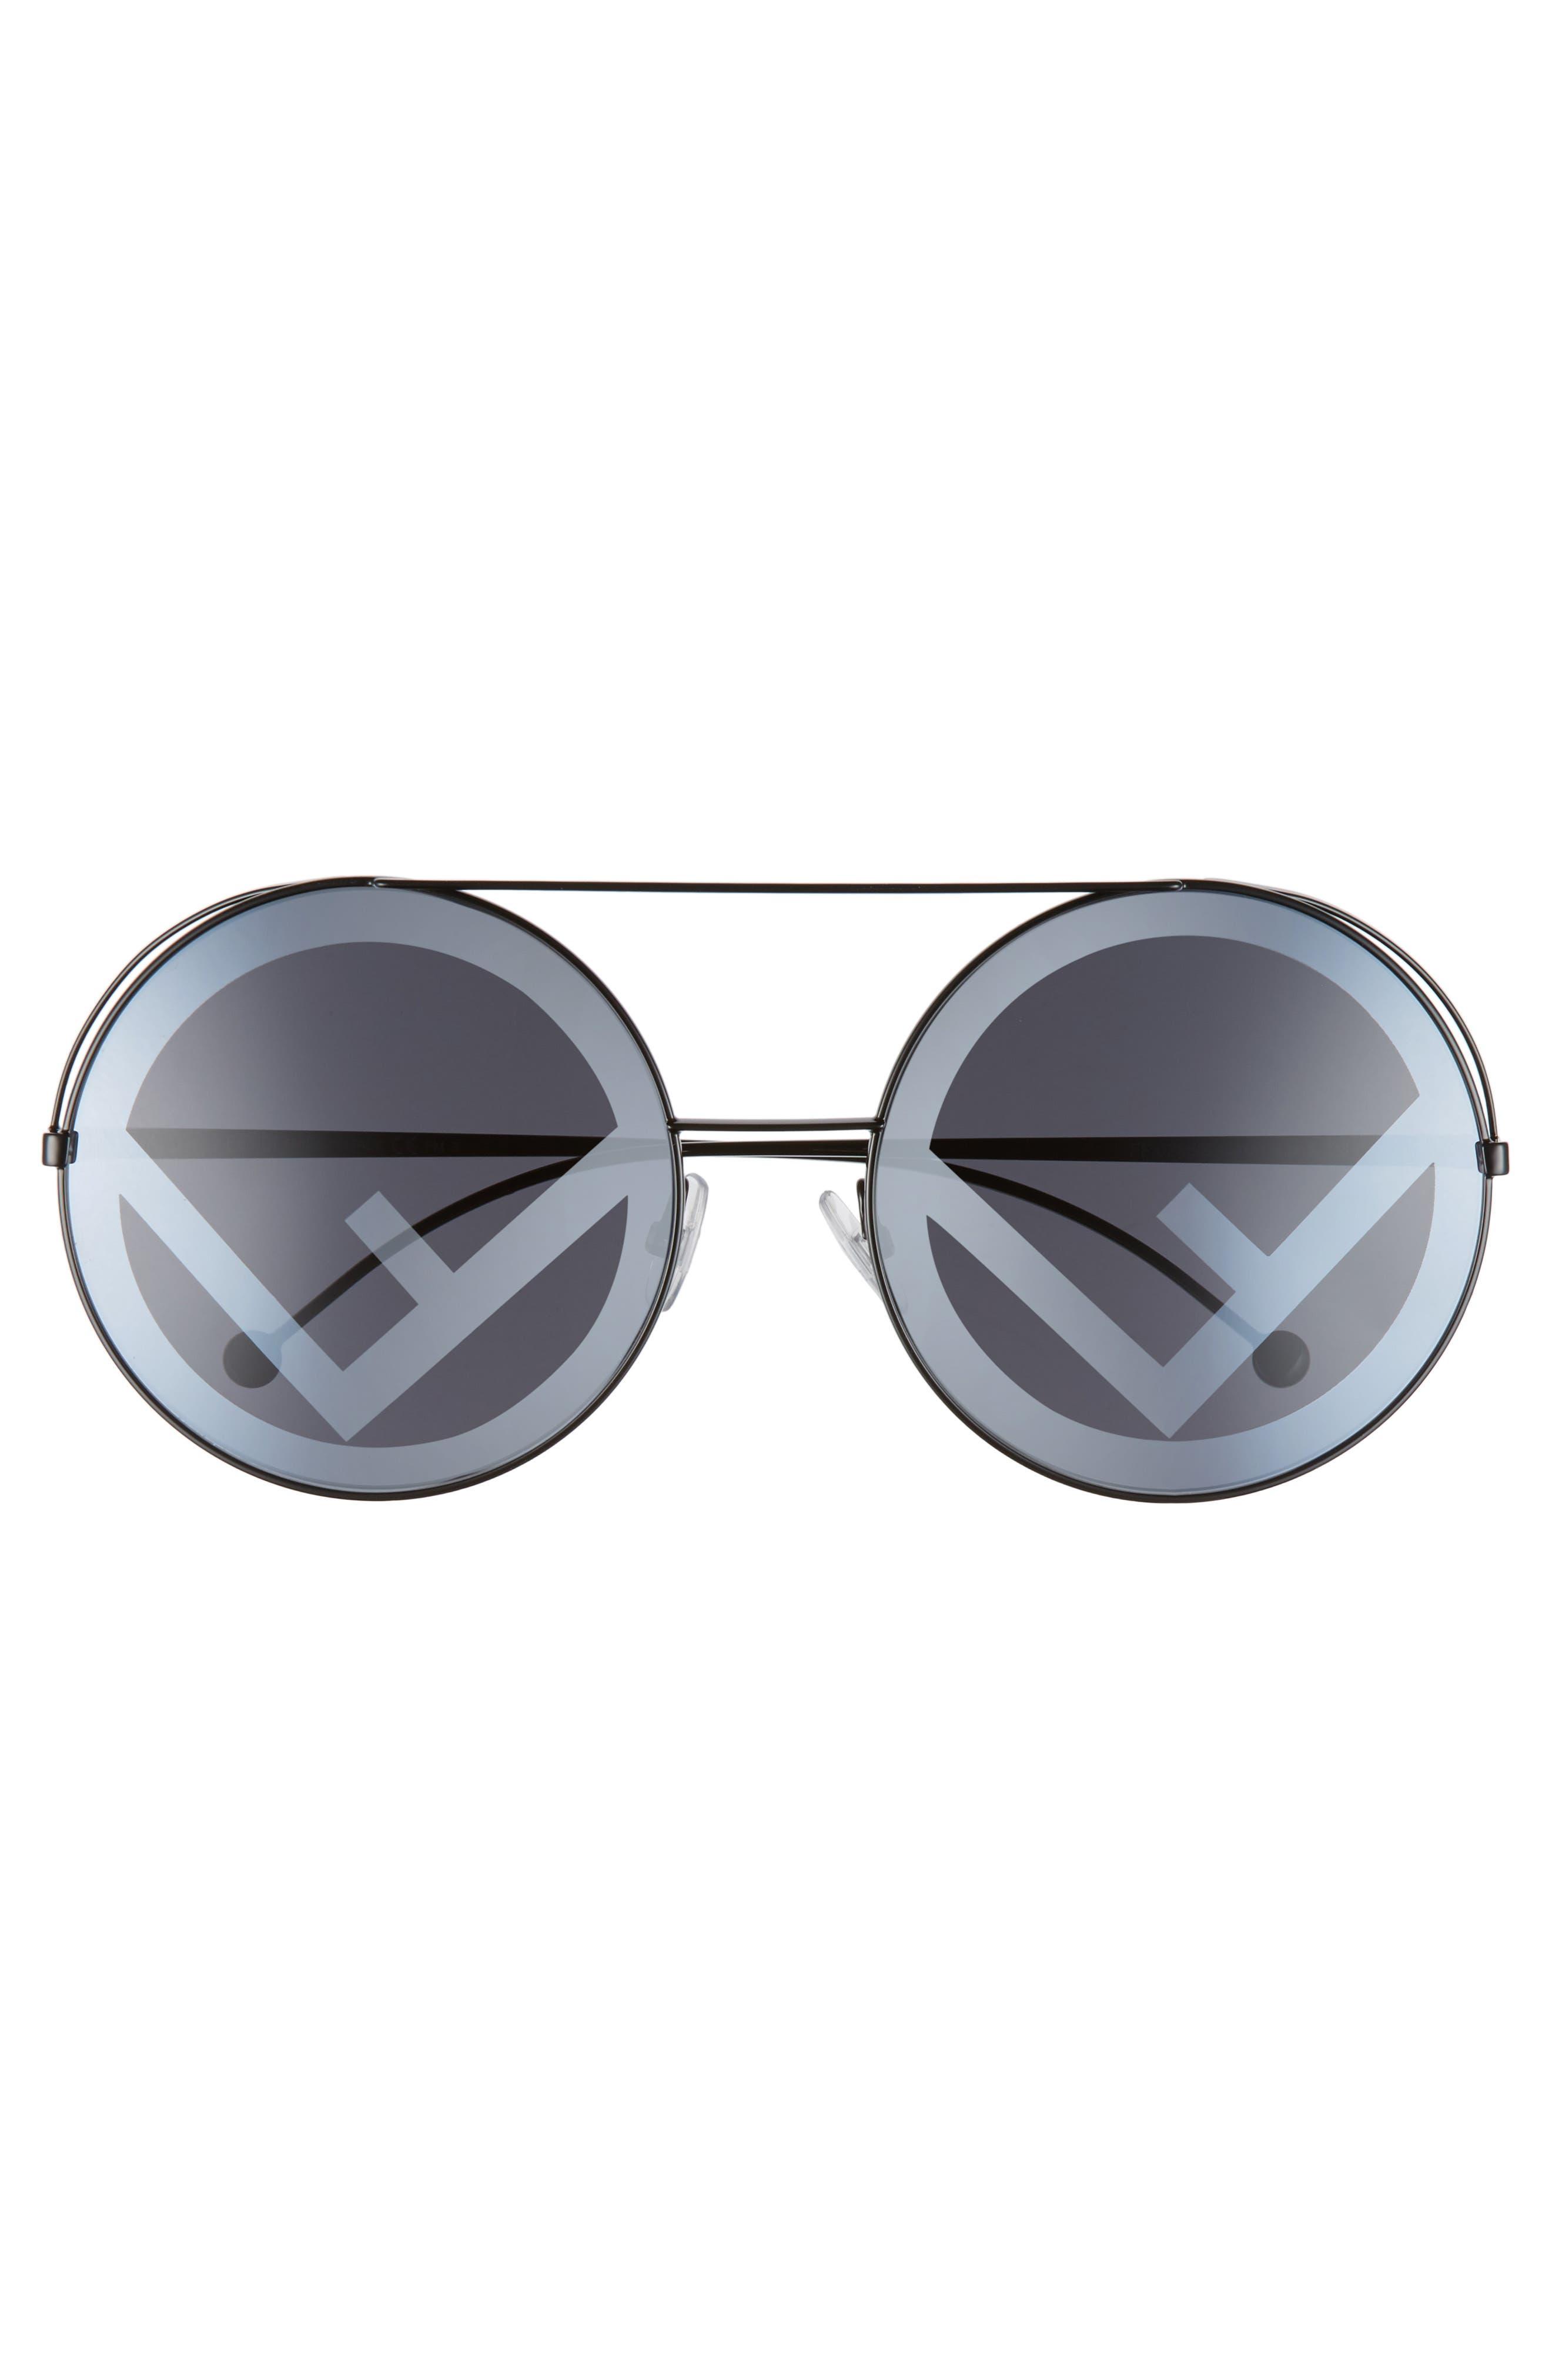 2985942f18bdc Fendi Round Logo Sunglasses